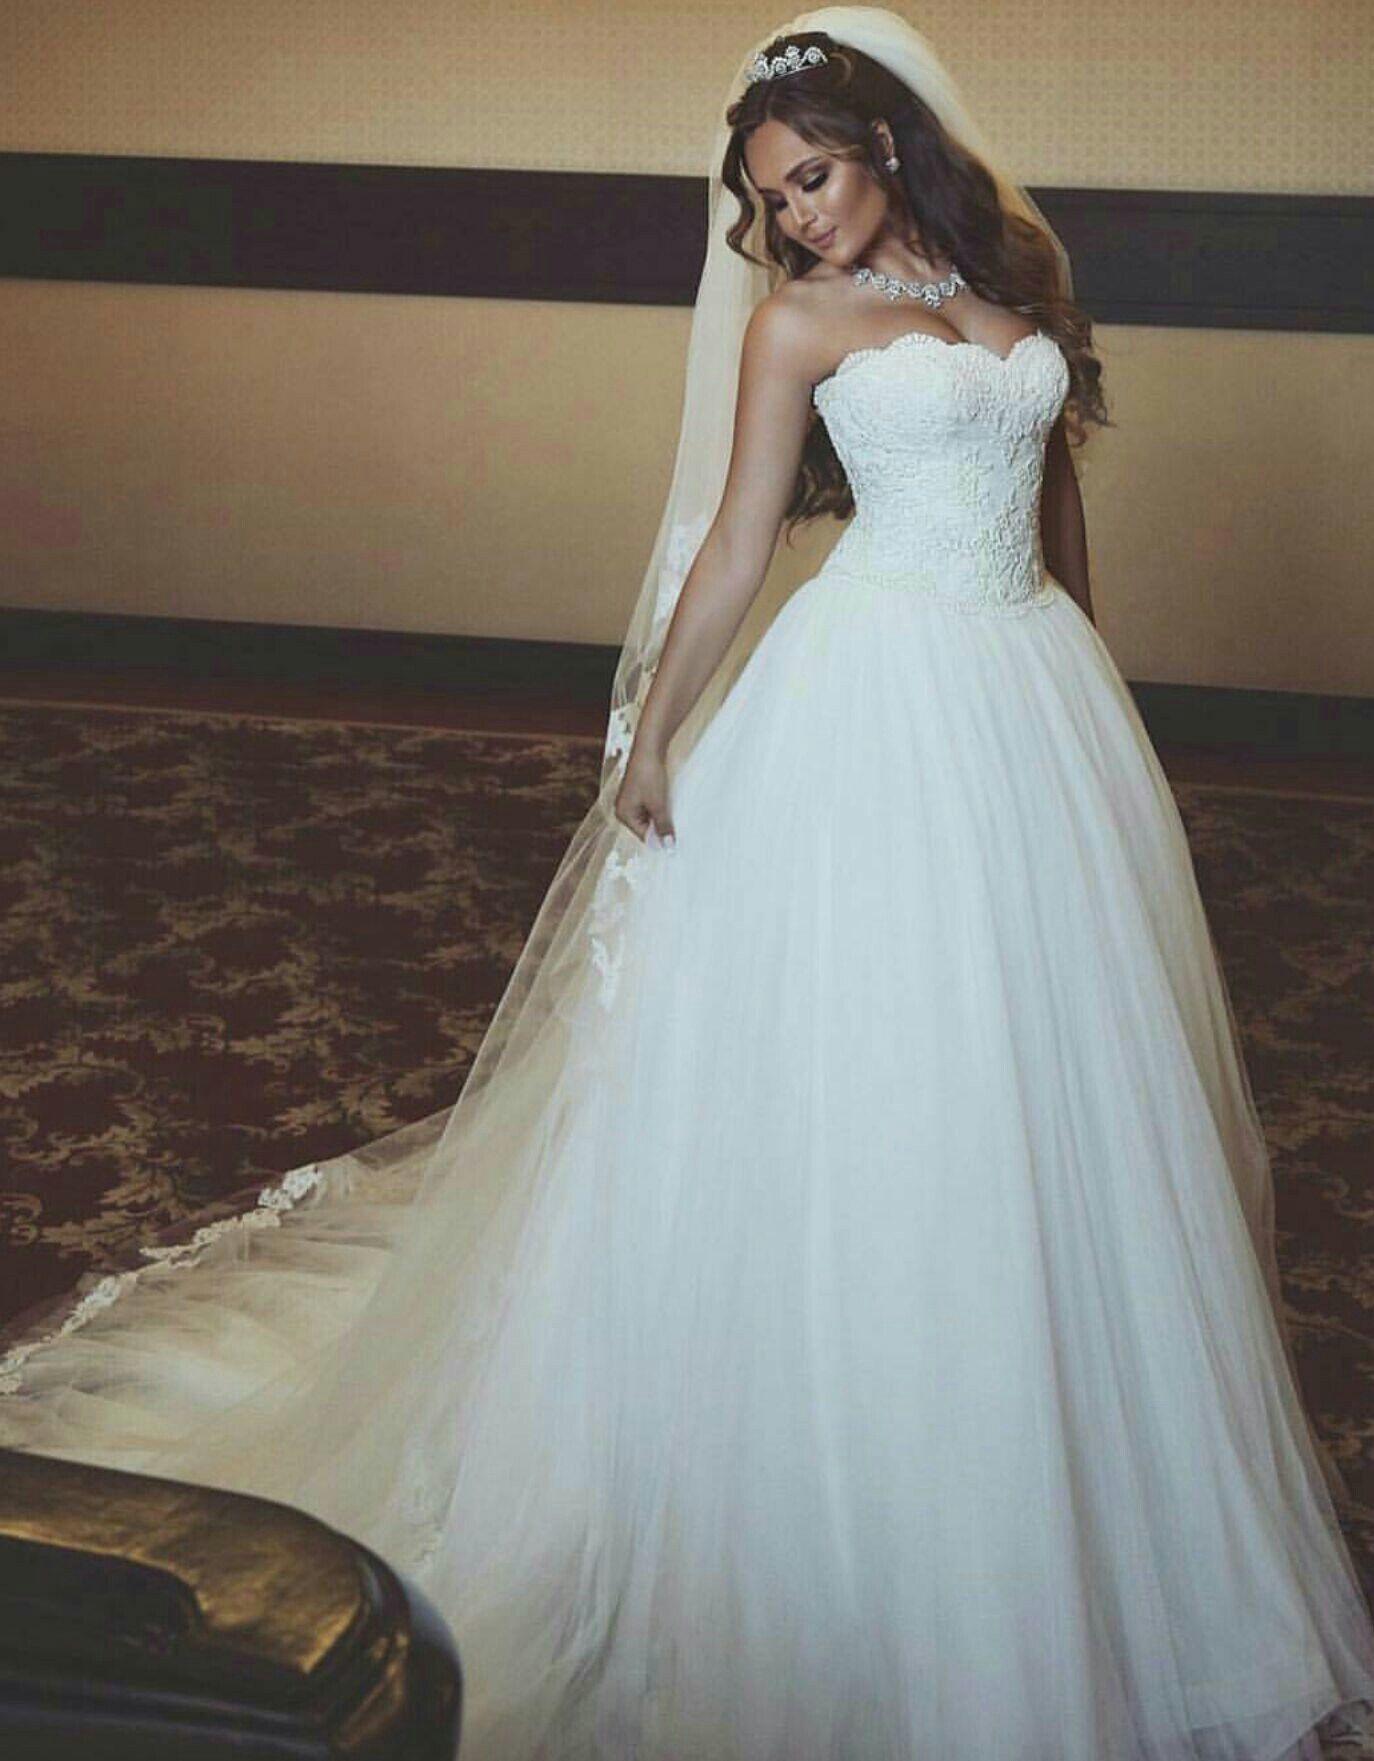 Pin by Mitra Ak on weddings | Pinterest | Weddings